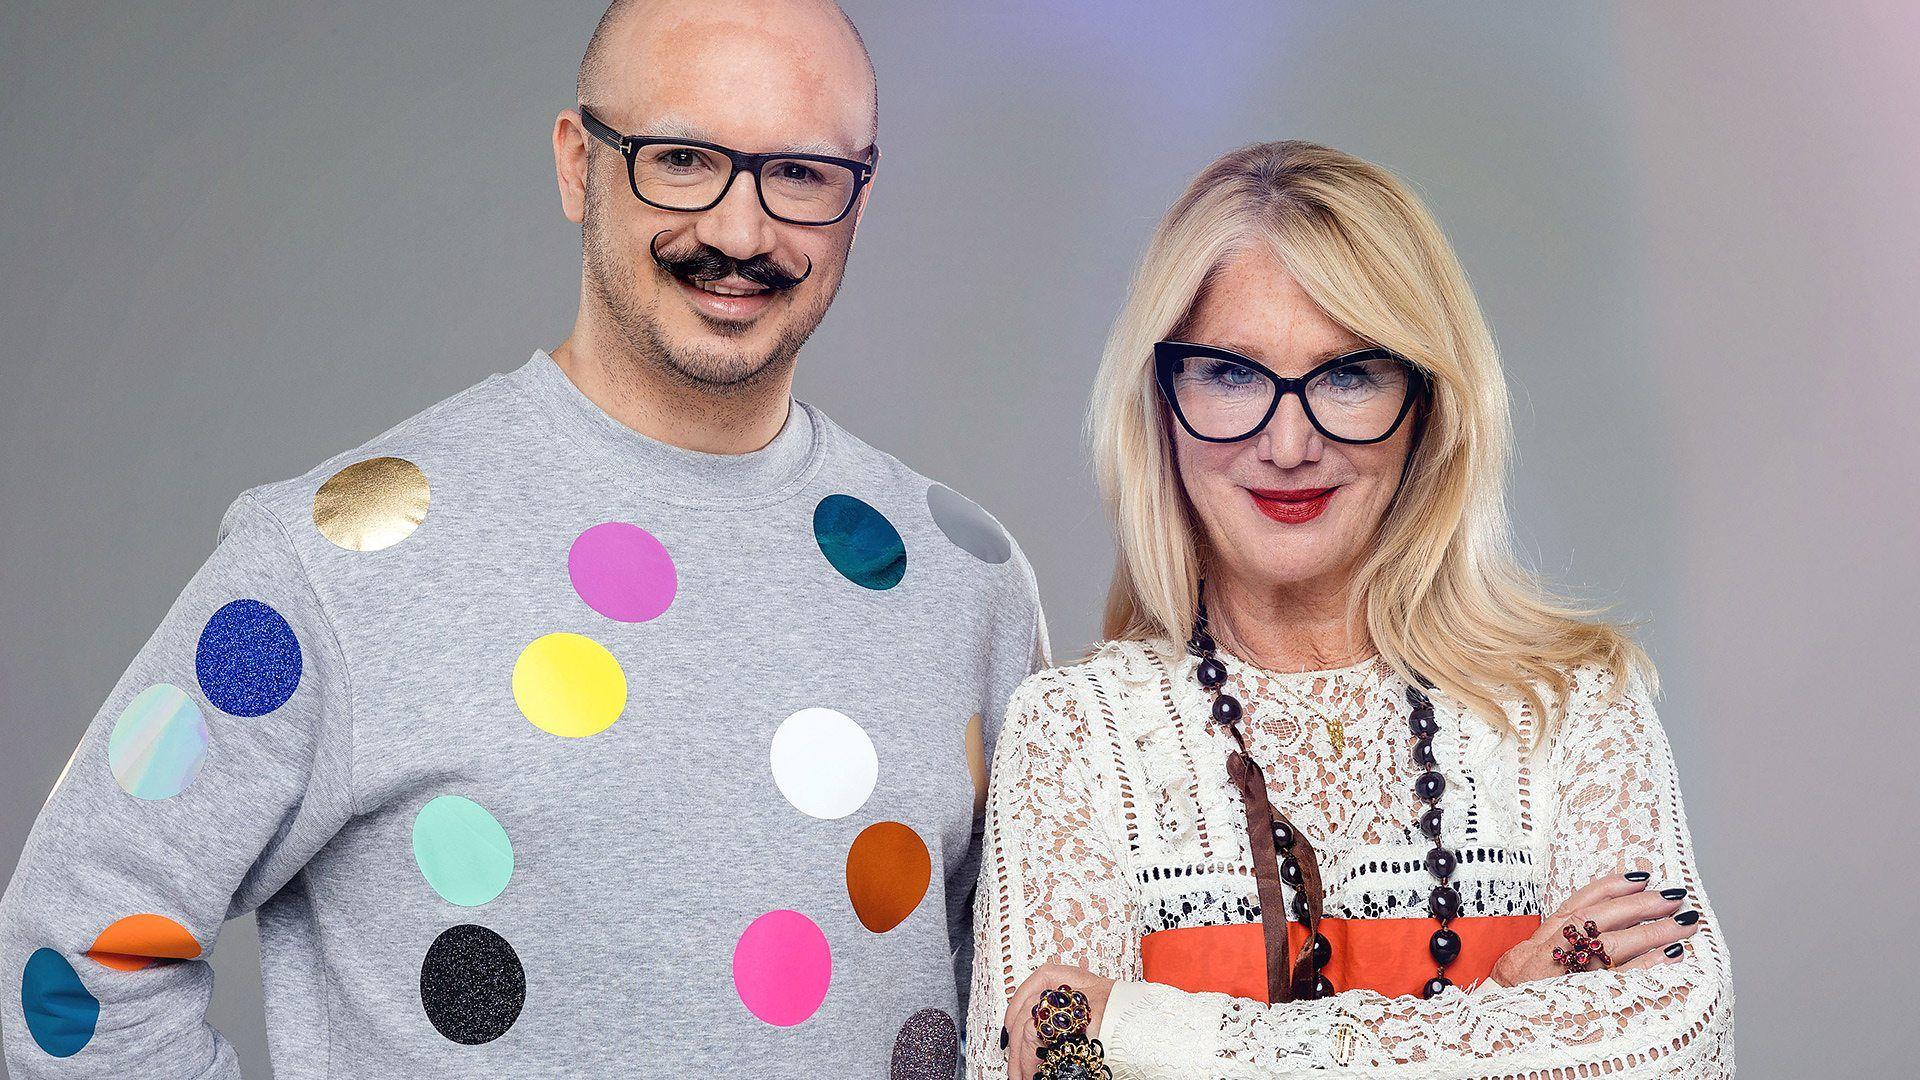 Glow Up: Britain's Next Make-Up Star — s01e02 — Movie Prosthetics